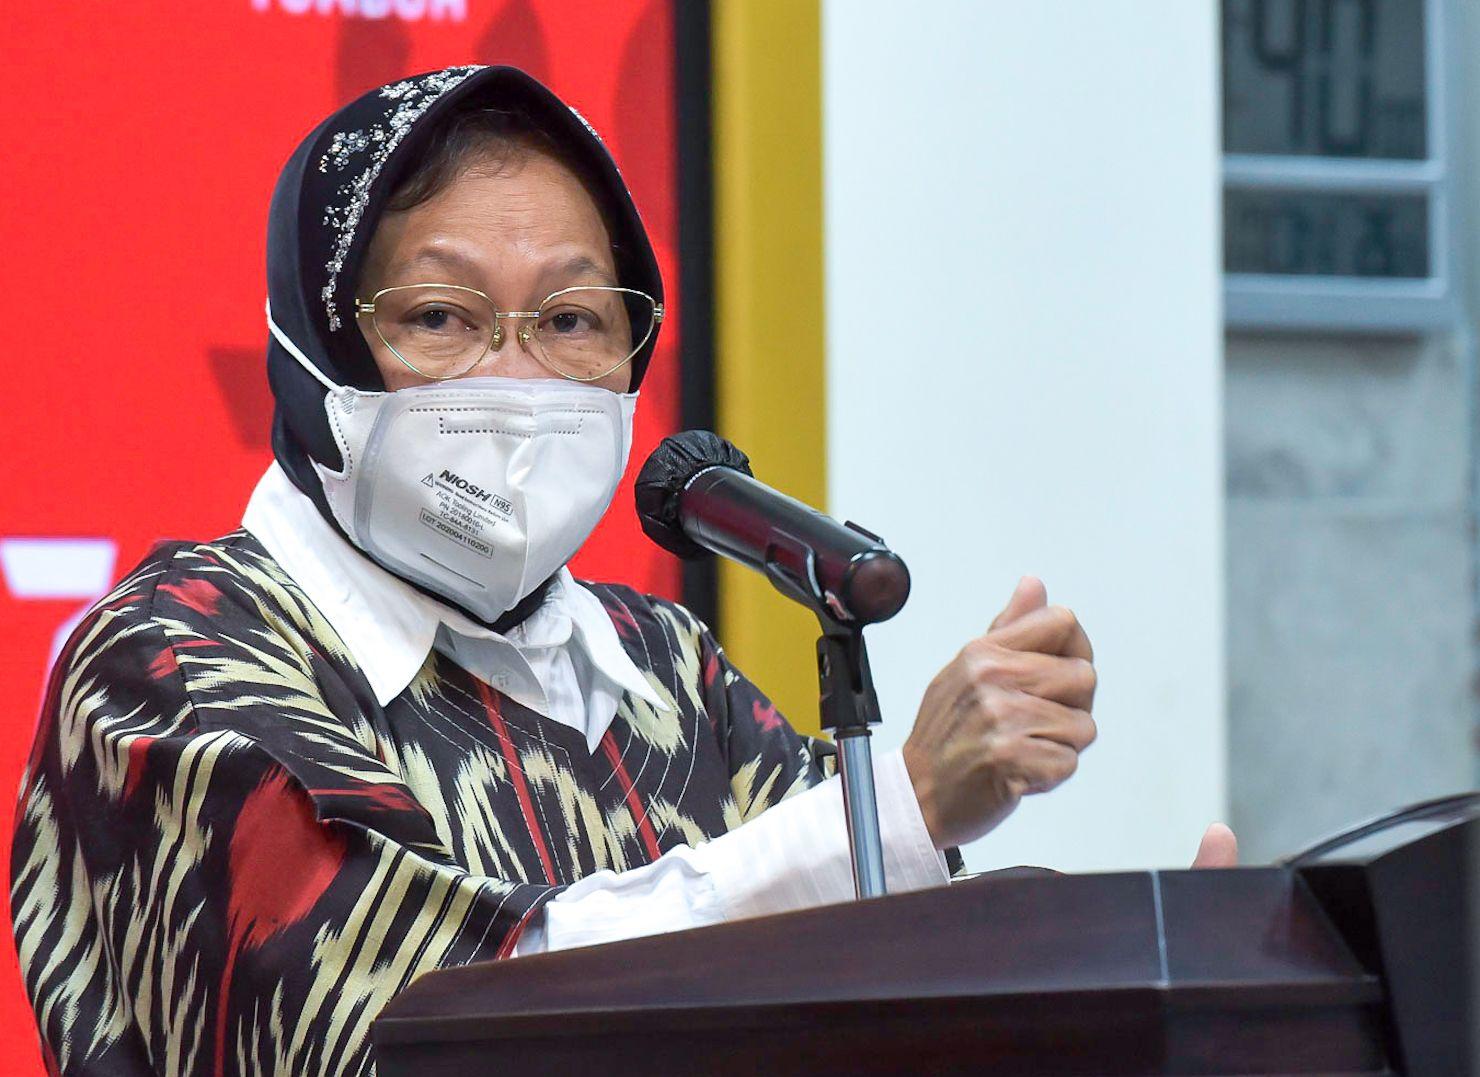 Usai Bikin Heboh Publik dengan Aksi Ngamuknya, Kini Risma Bakal Tinggalkan Jakarta dan Pindah Kantor ke Papua